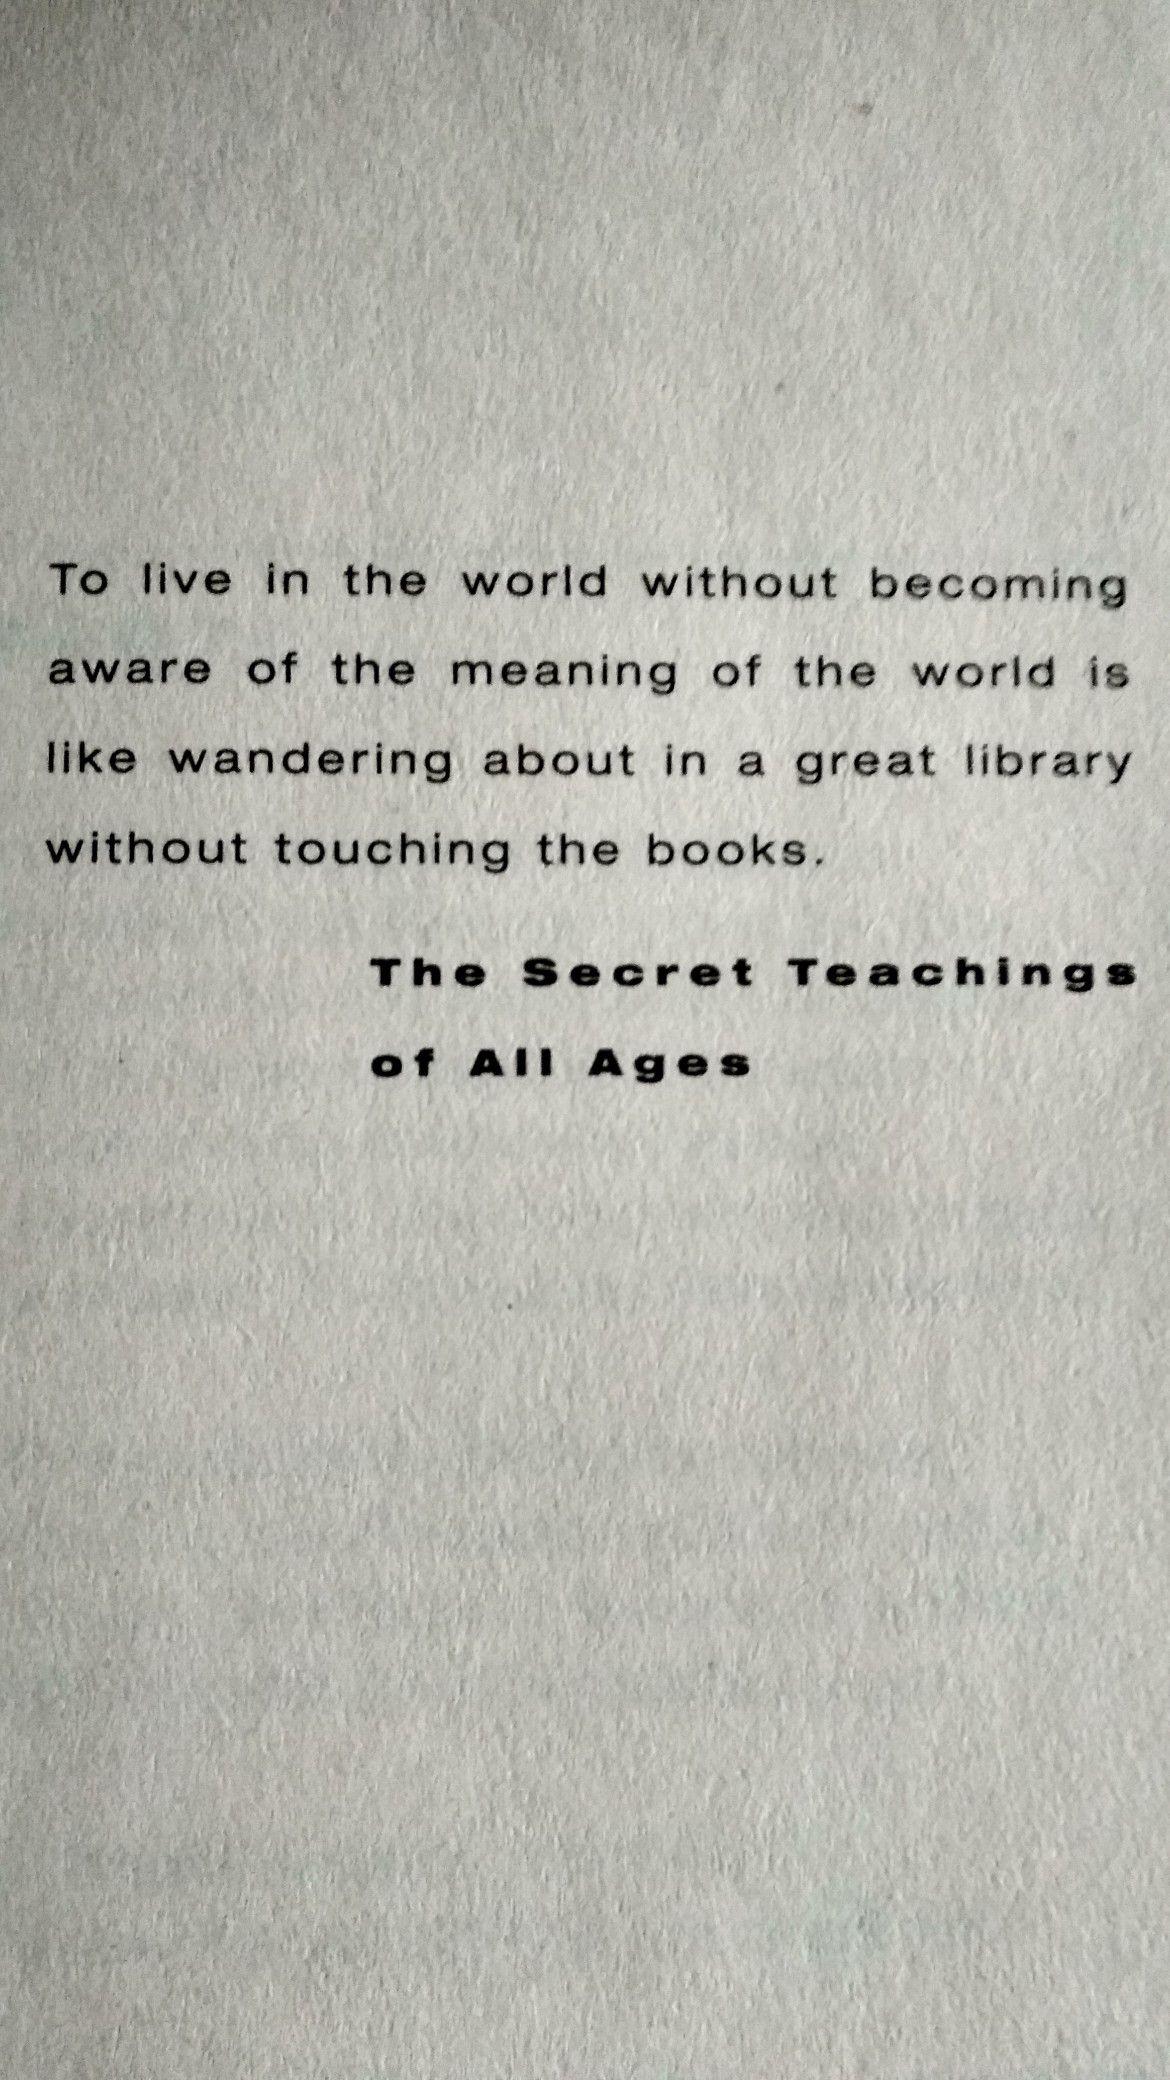 Pin by Dheeraj Bhardwaj on none Teachings, Awareness